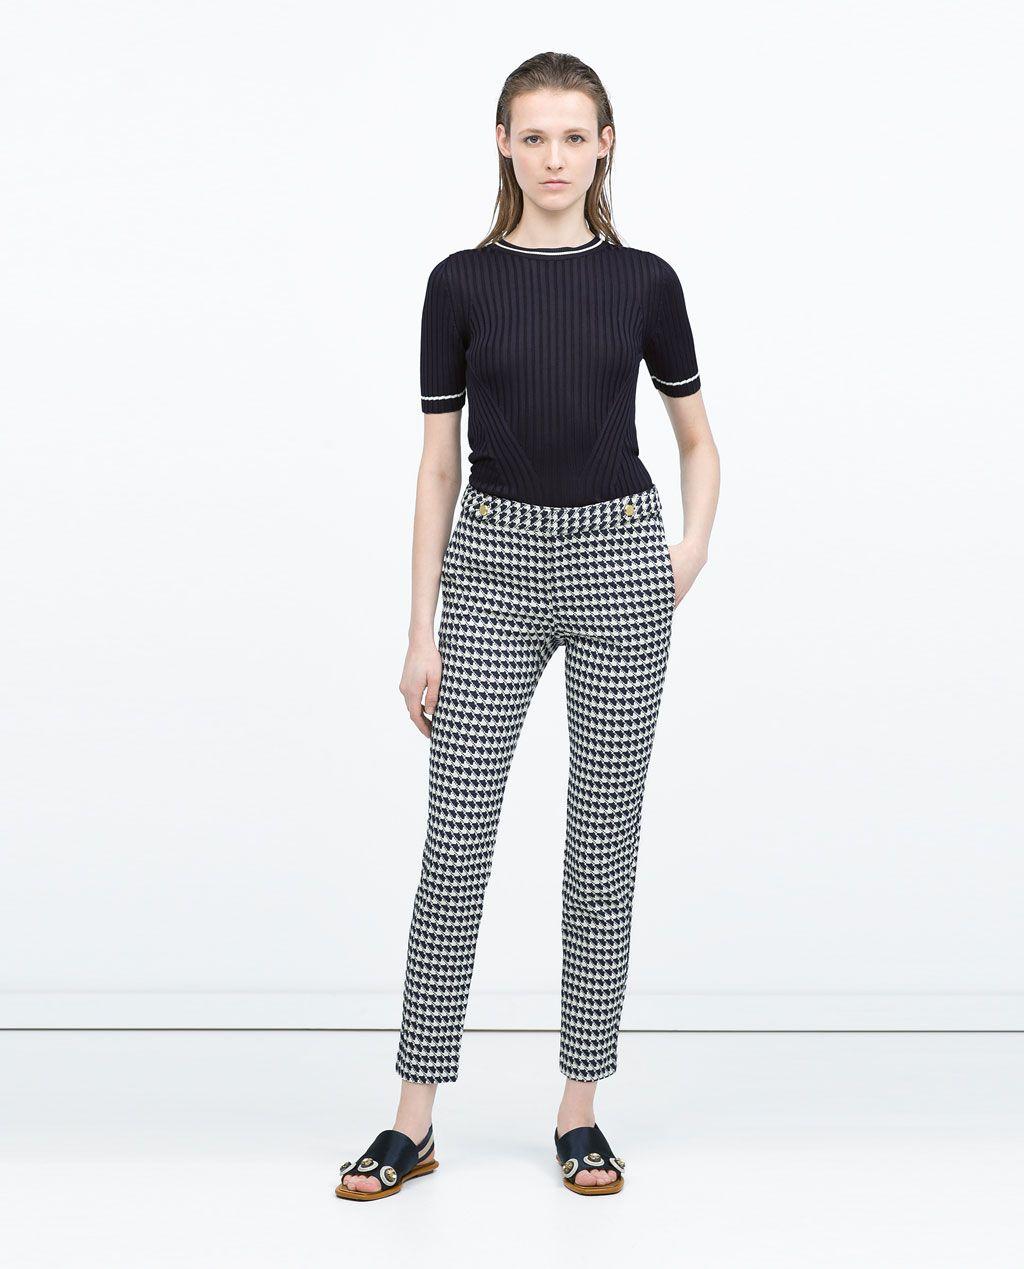 43d51ae1cc ZARA - ÚLTIMA SEMANA - PANTALON BOTONES CINTURA Zara Mujer Pantalones